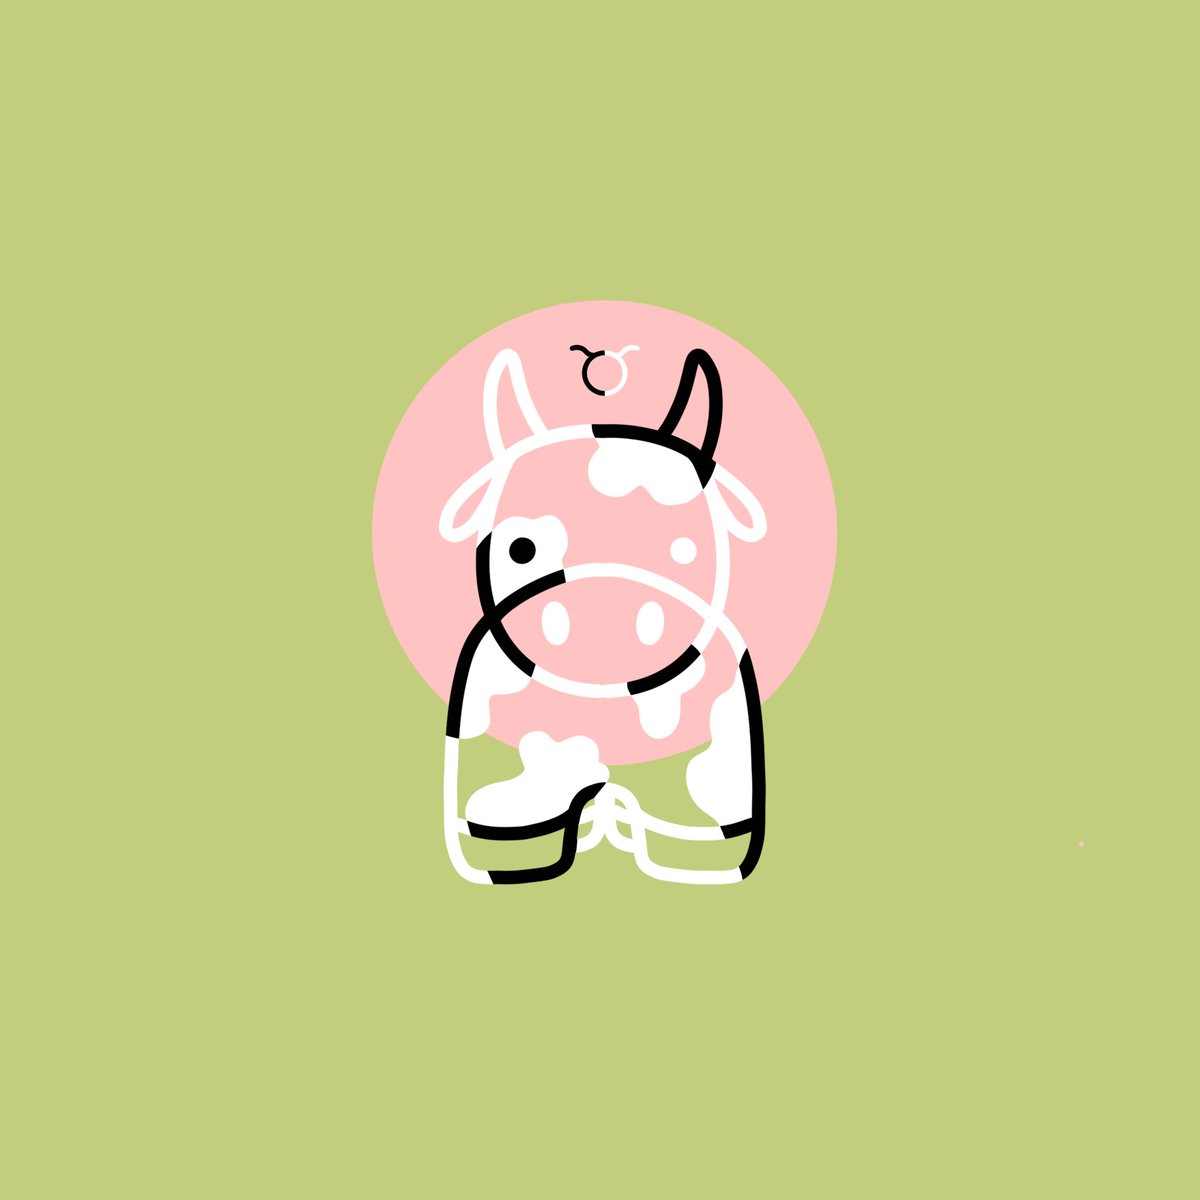 earth day is during taurus szn for a reason ✌️  love,  the best earth sign 🌱✨  #EarthDay #TaurusSeason #zodiac #bull #cow #cute #digitalart #art #graphicdesign #taurus #Horoscope #illustration #digitalillustration #doodle https://t.co/5vclhJWKOi